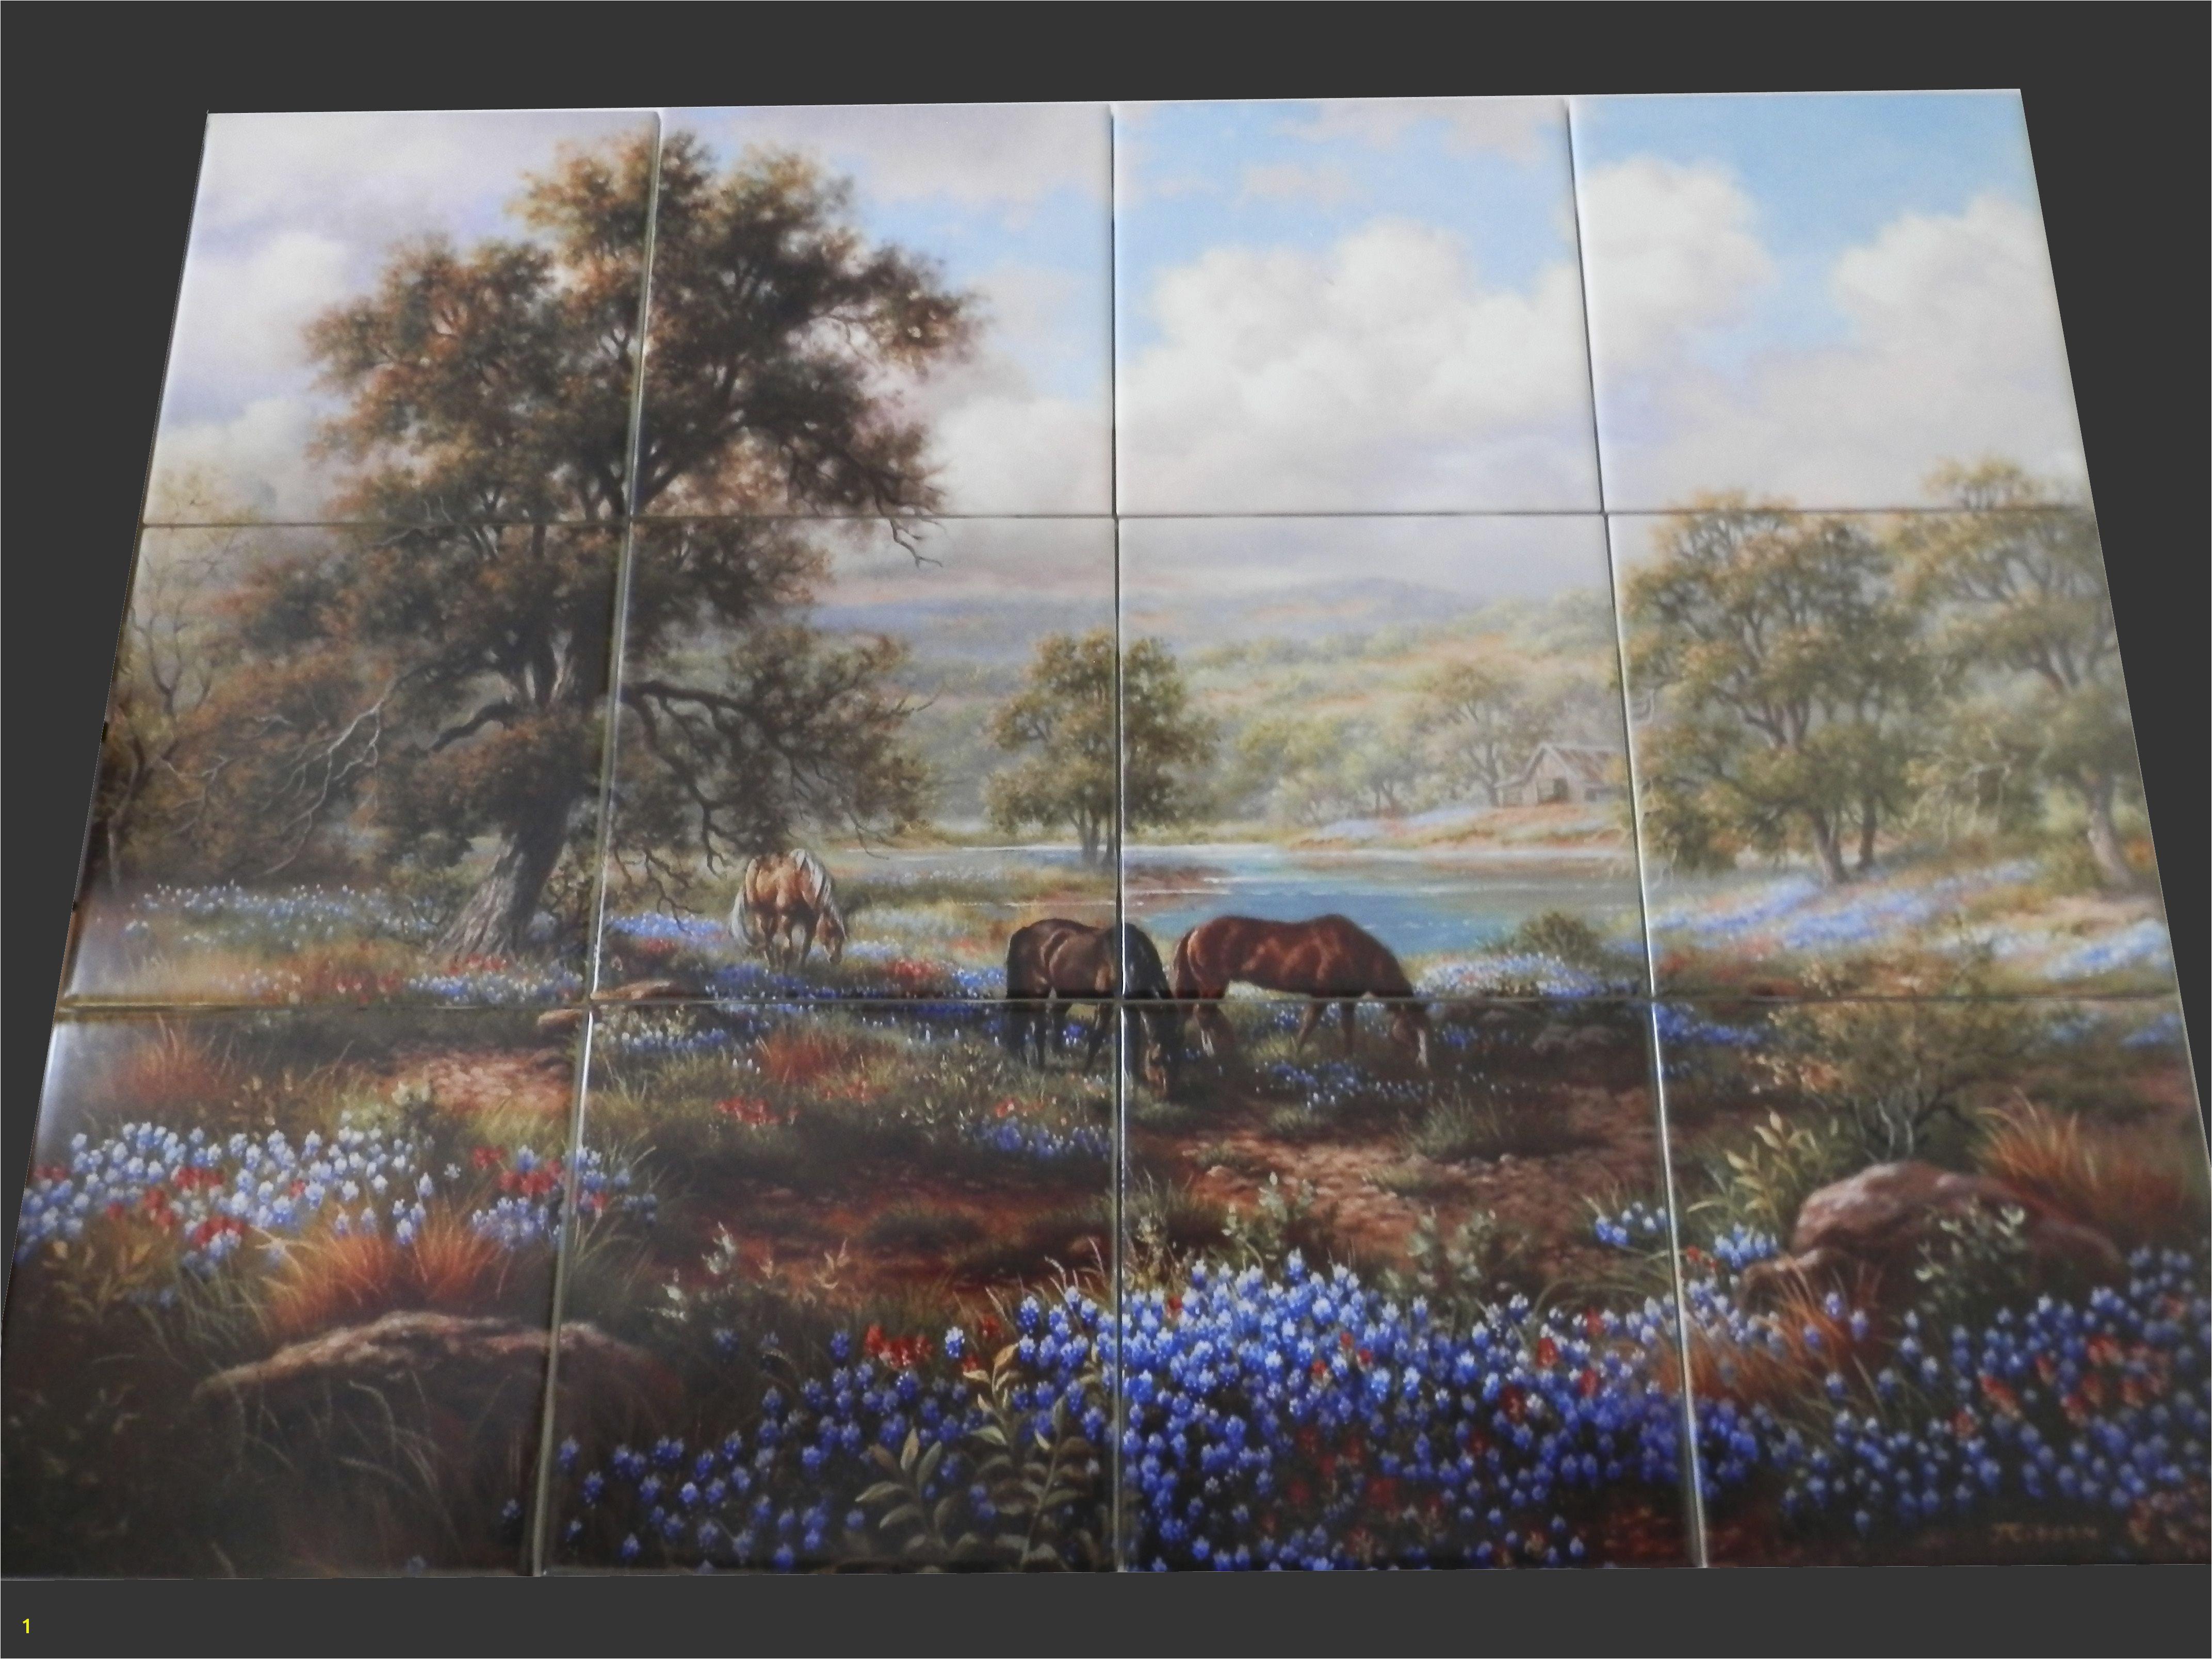 Decorative horse themed tiles make an impressive kitchen backsplash idea You can use a tile